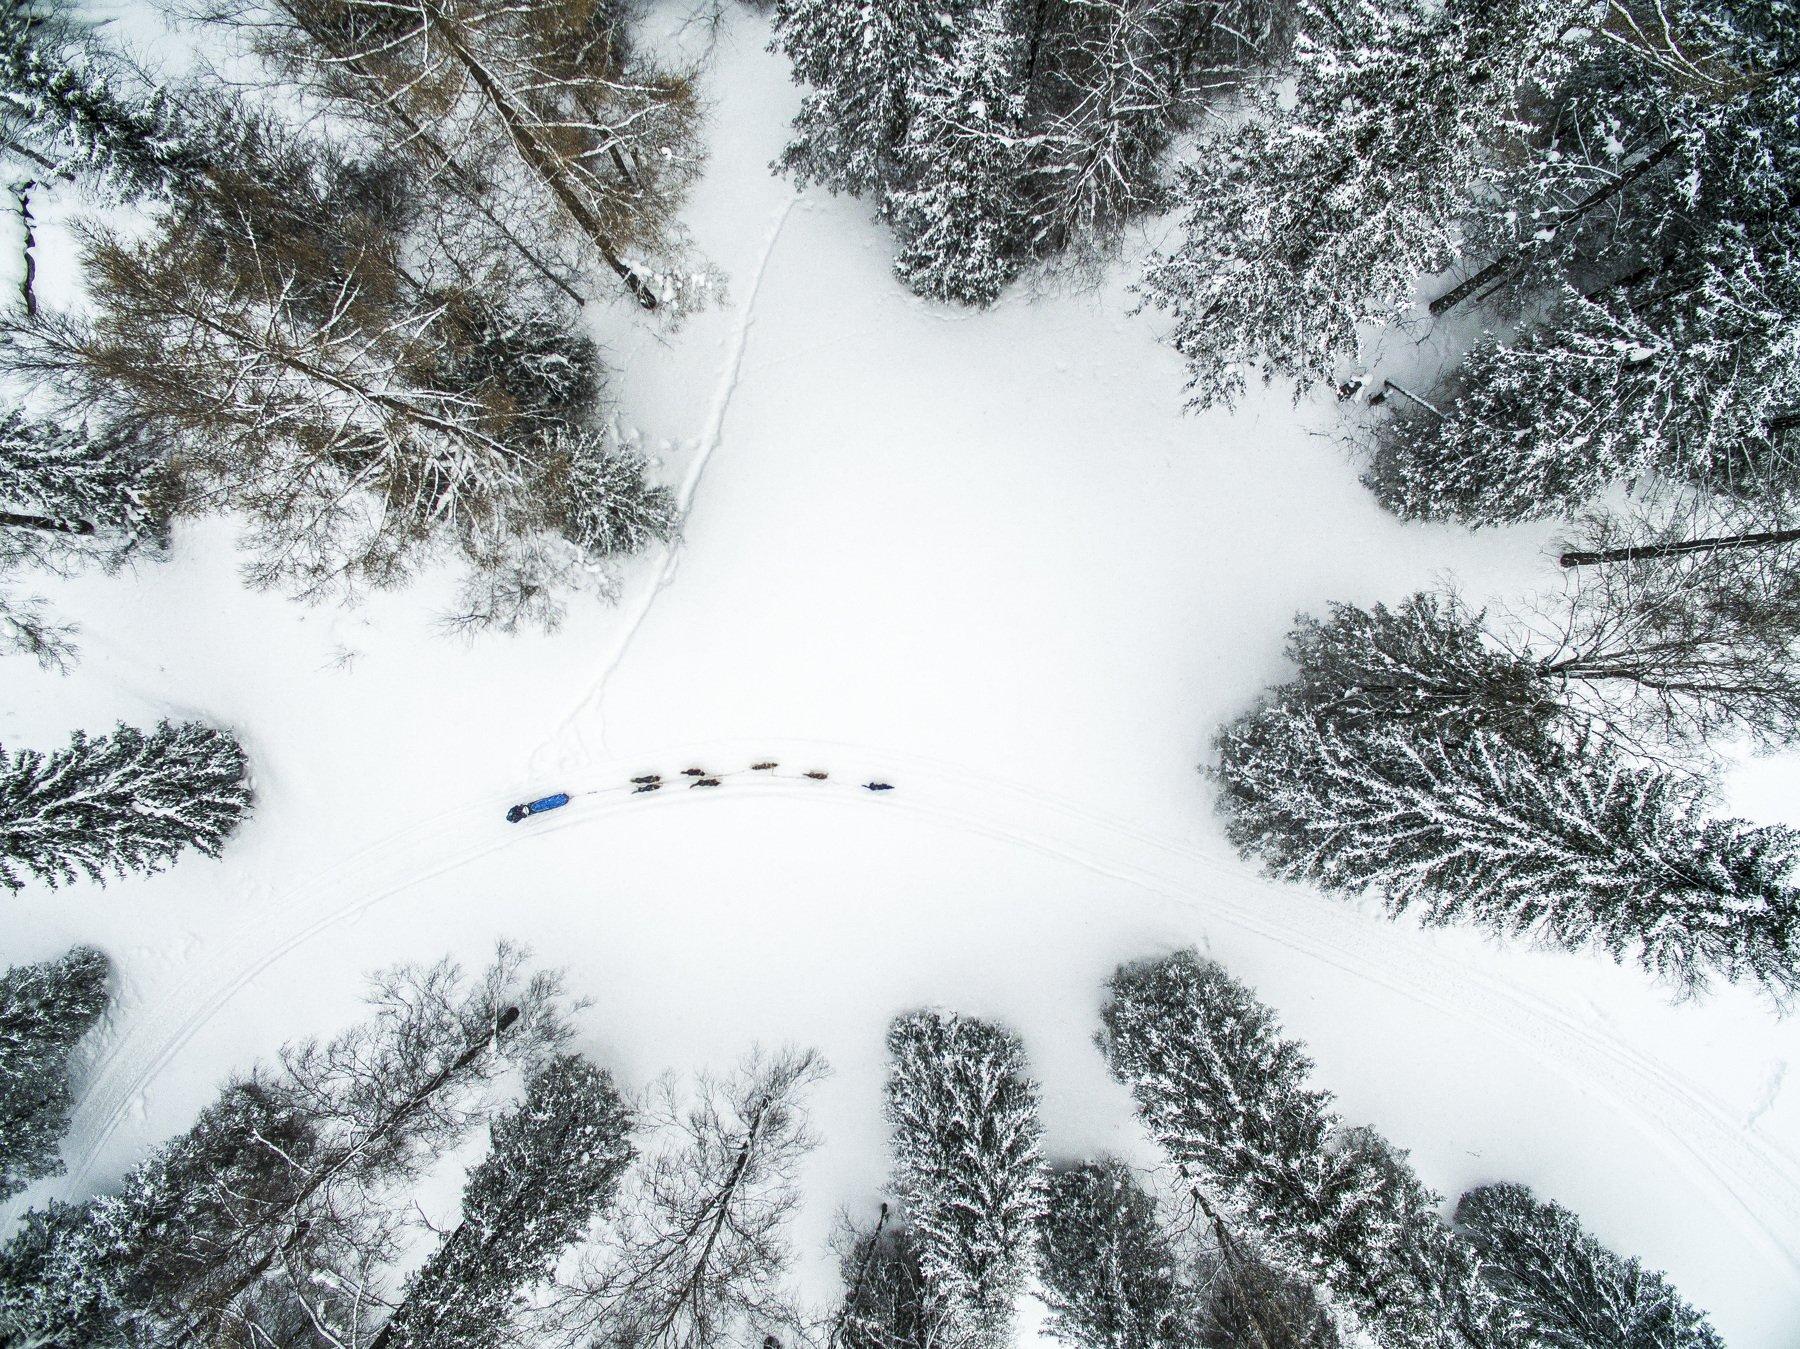 sled, dog, winter, snow, forest, Tarasov Maksim